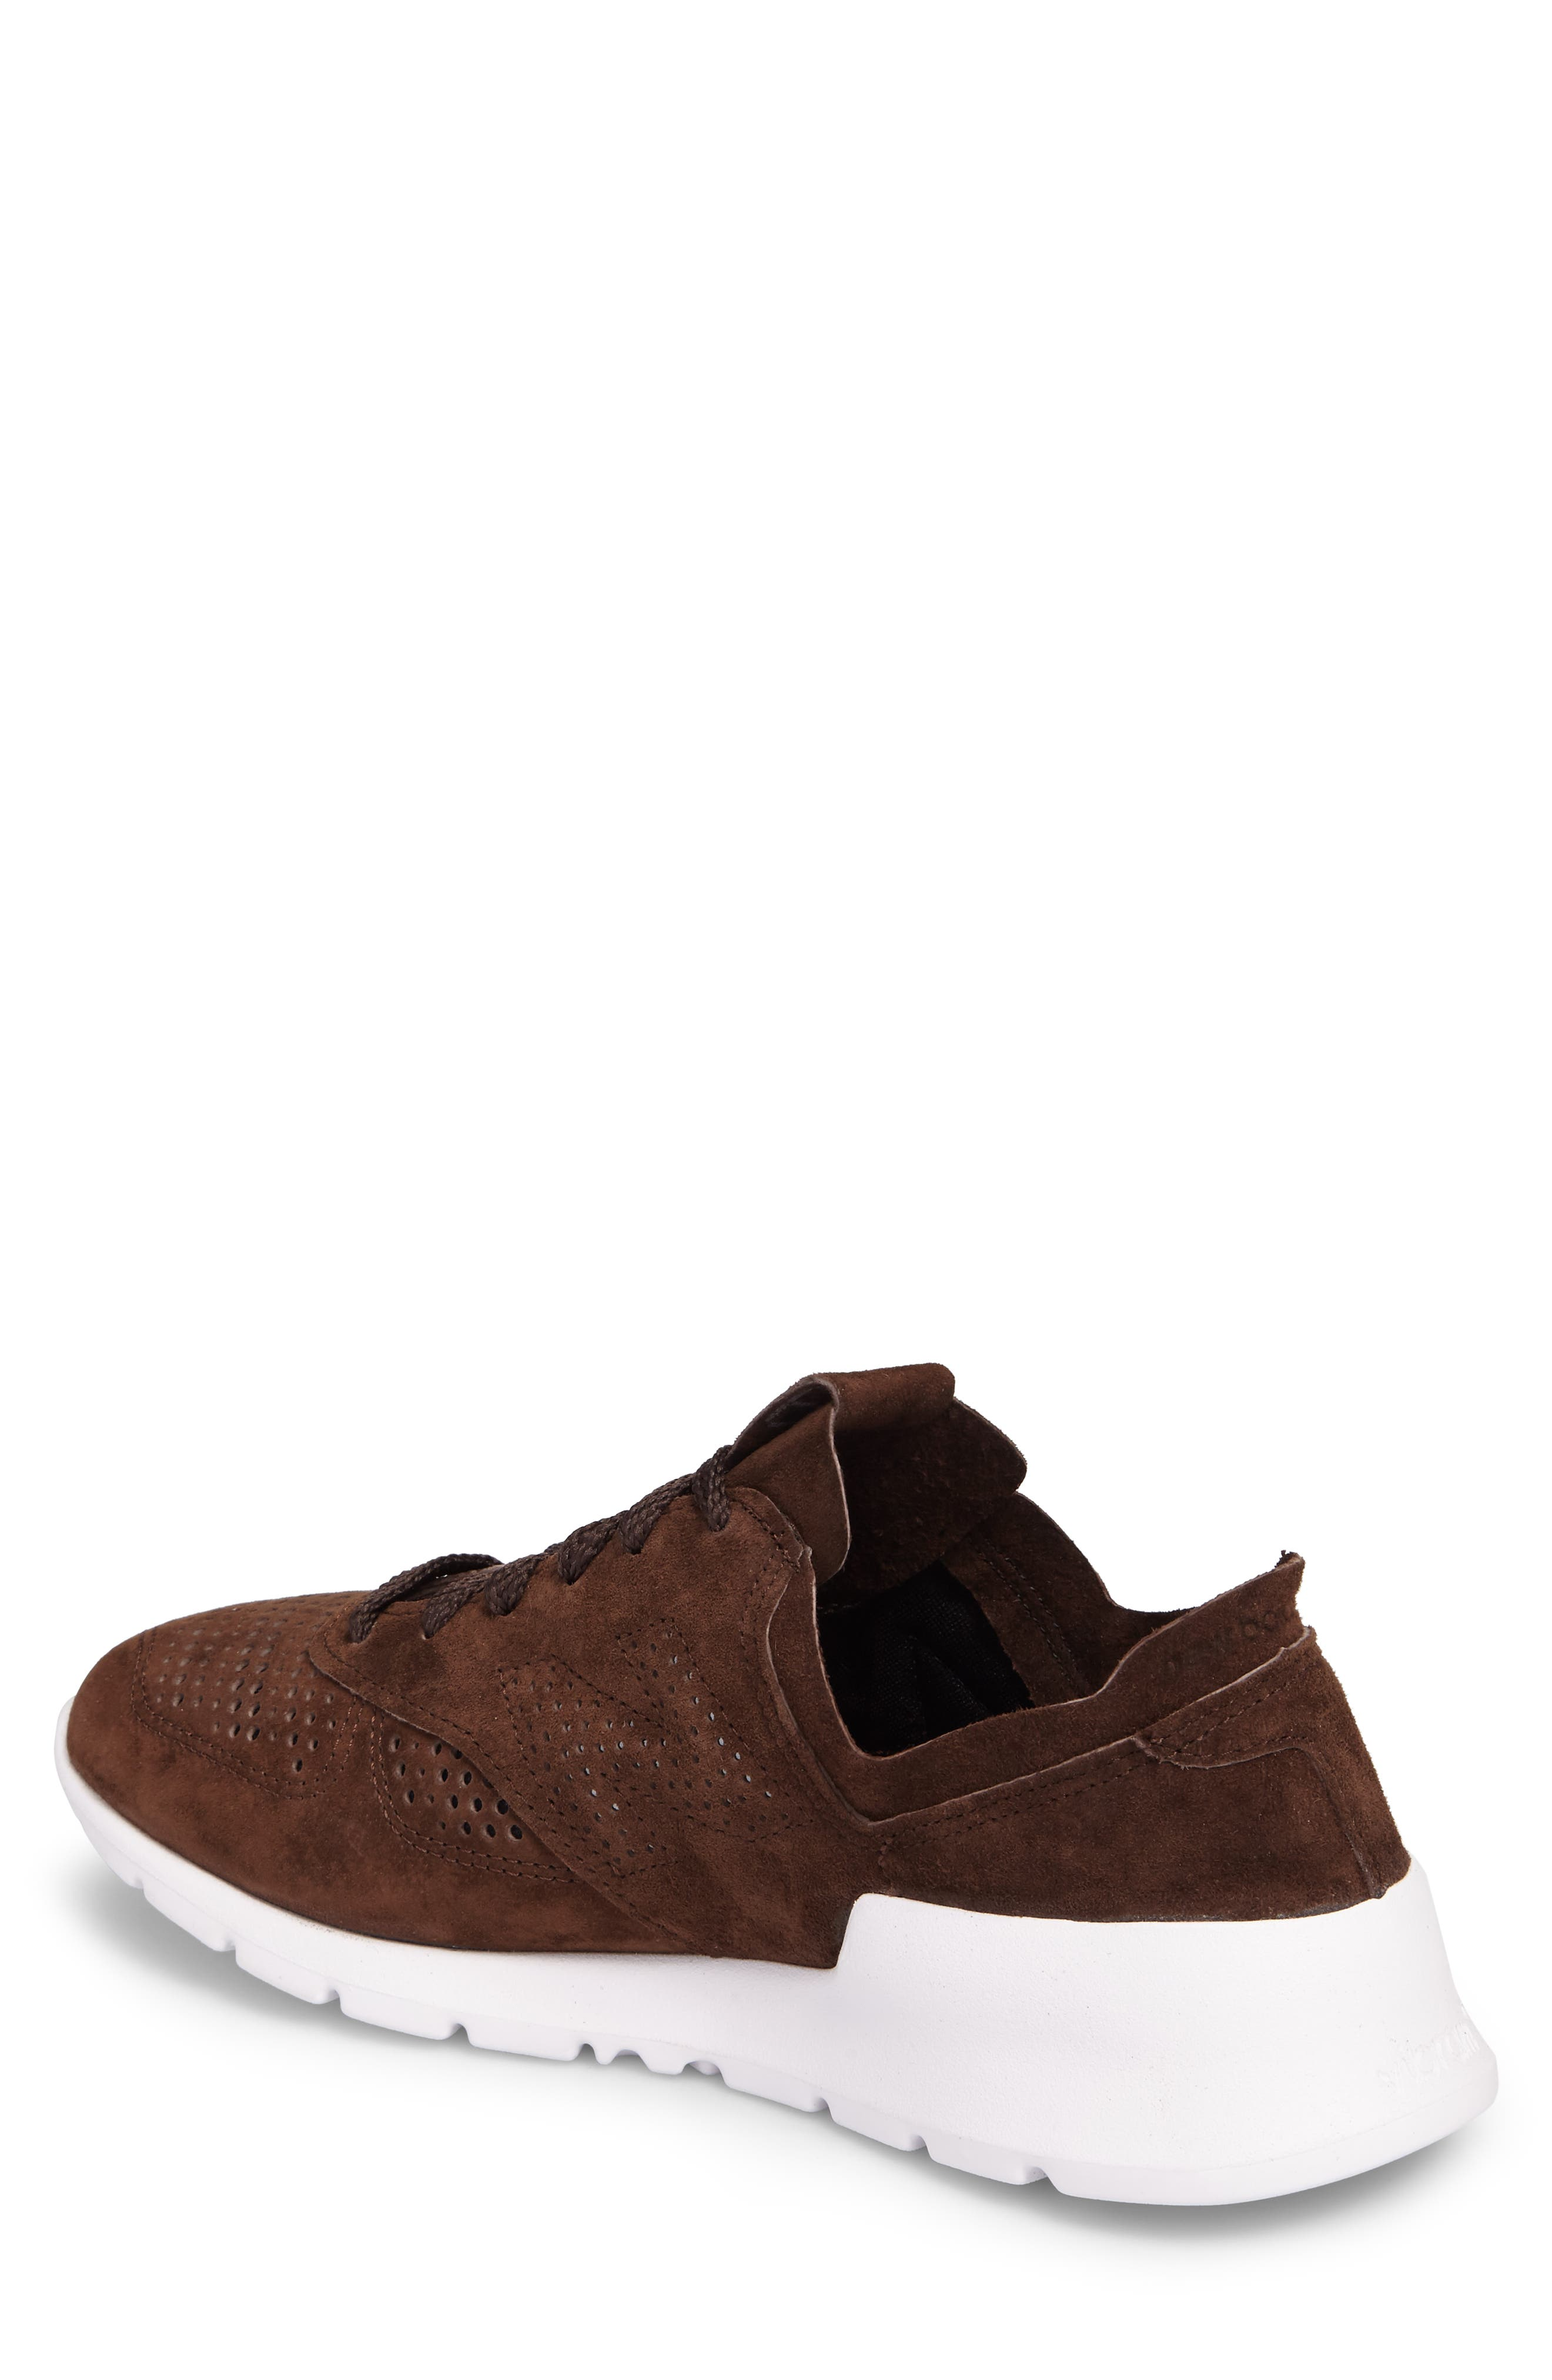 1978 Sneaker,                             Alternate thumbnail 2, color,                             Brown